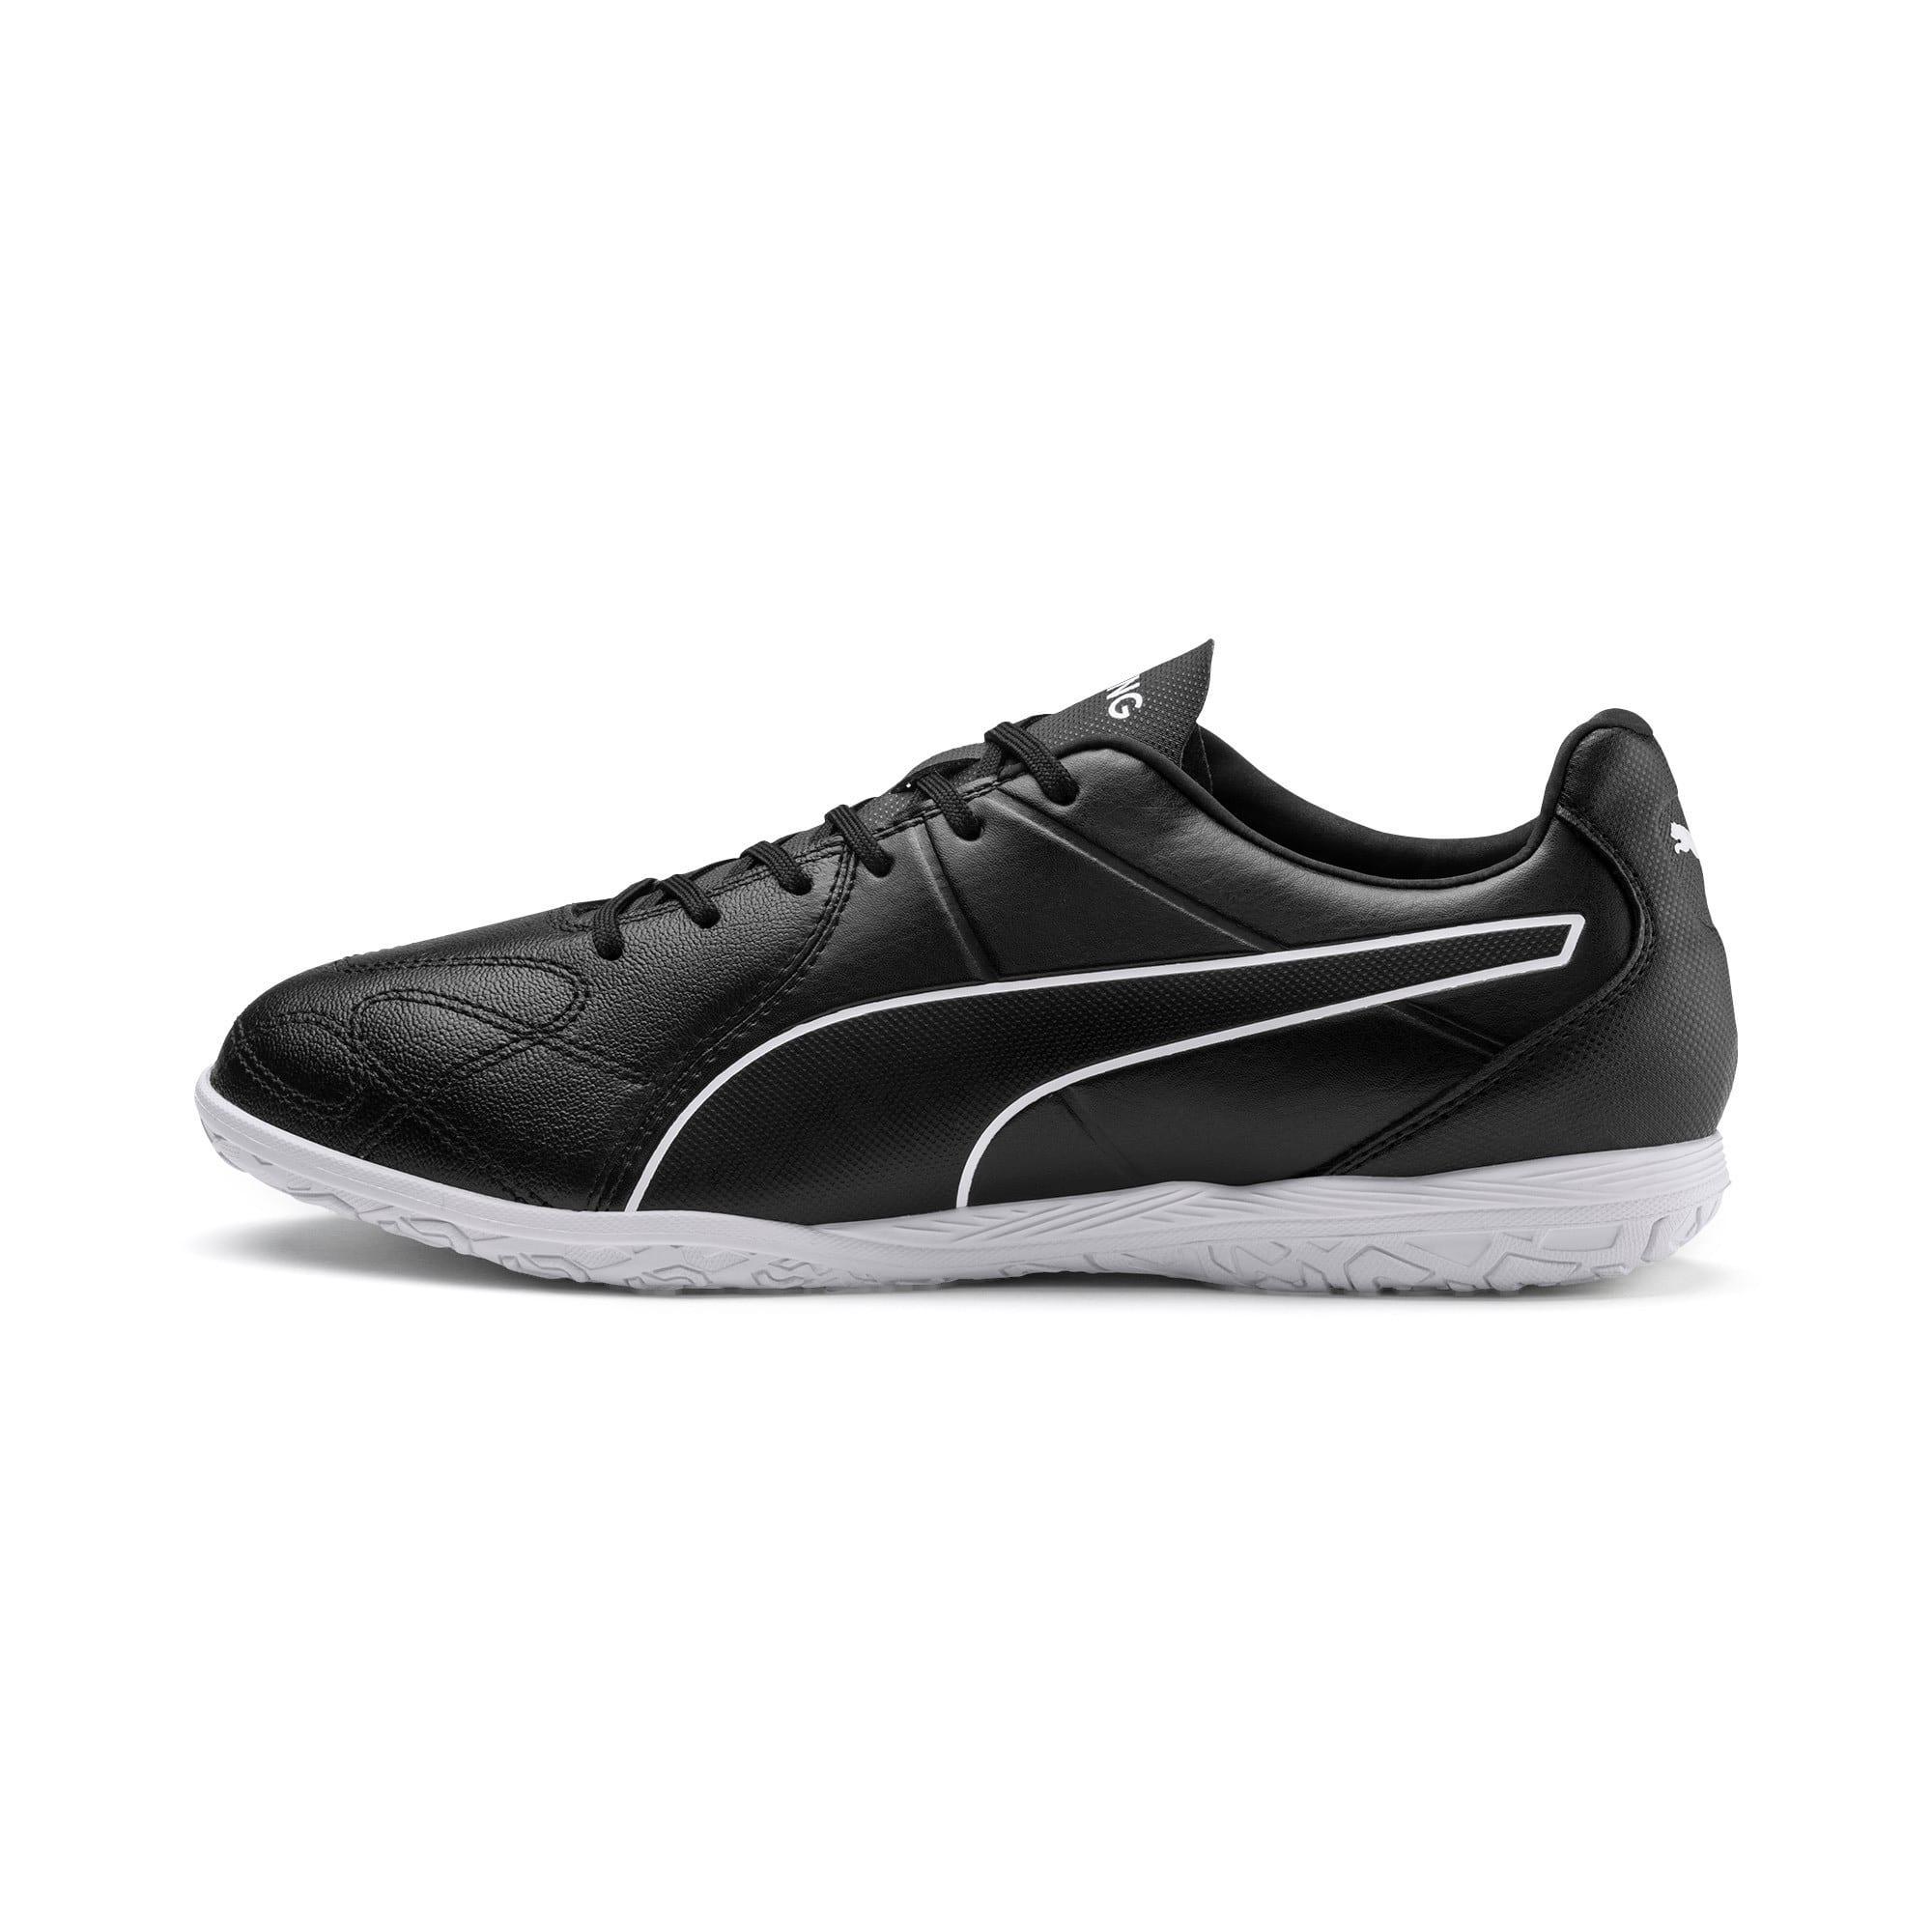 Thumbnail 1 of KING Hero IT Football Boots, Puma Black-Puma White, medium